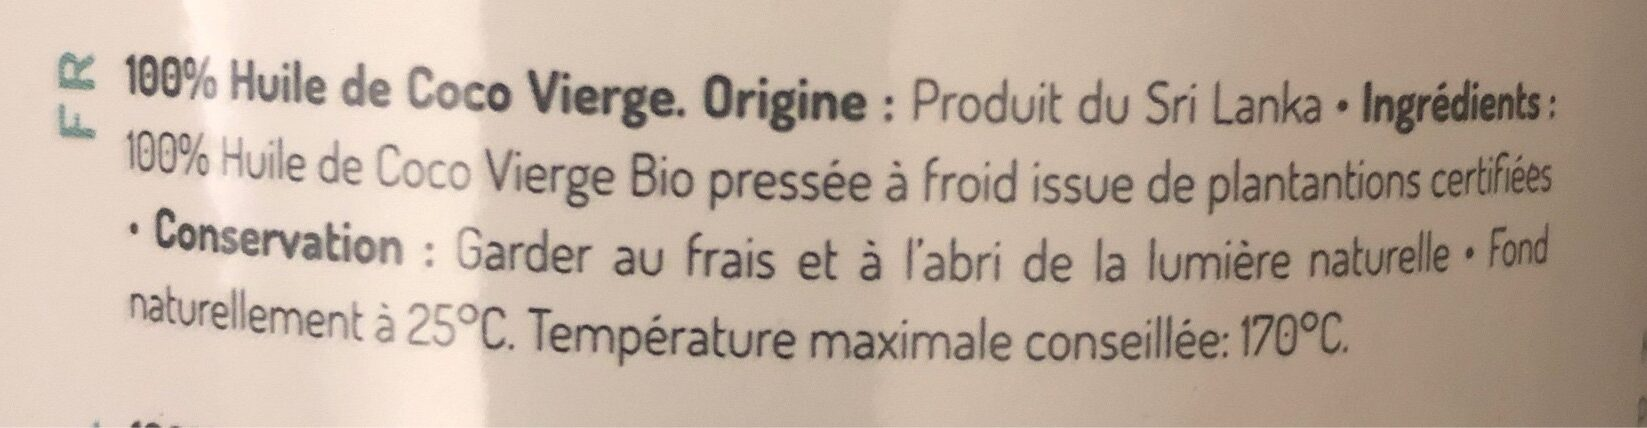 Coconut oil - Ingrédients - fr